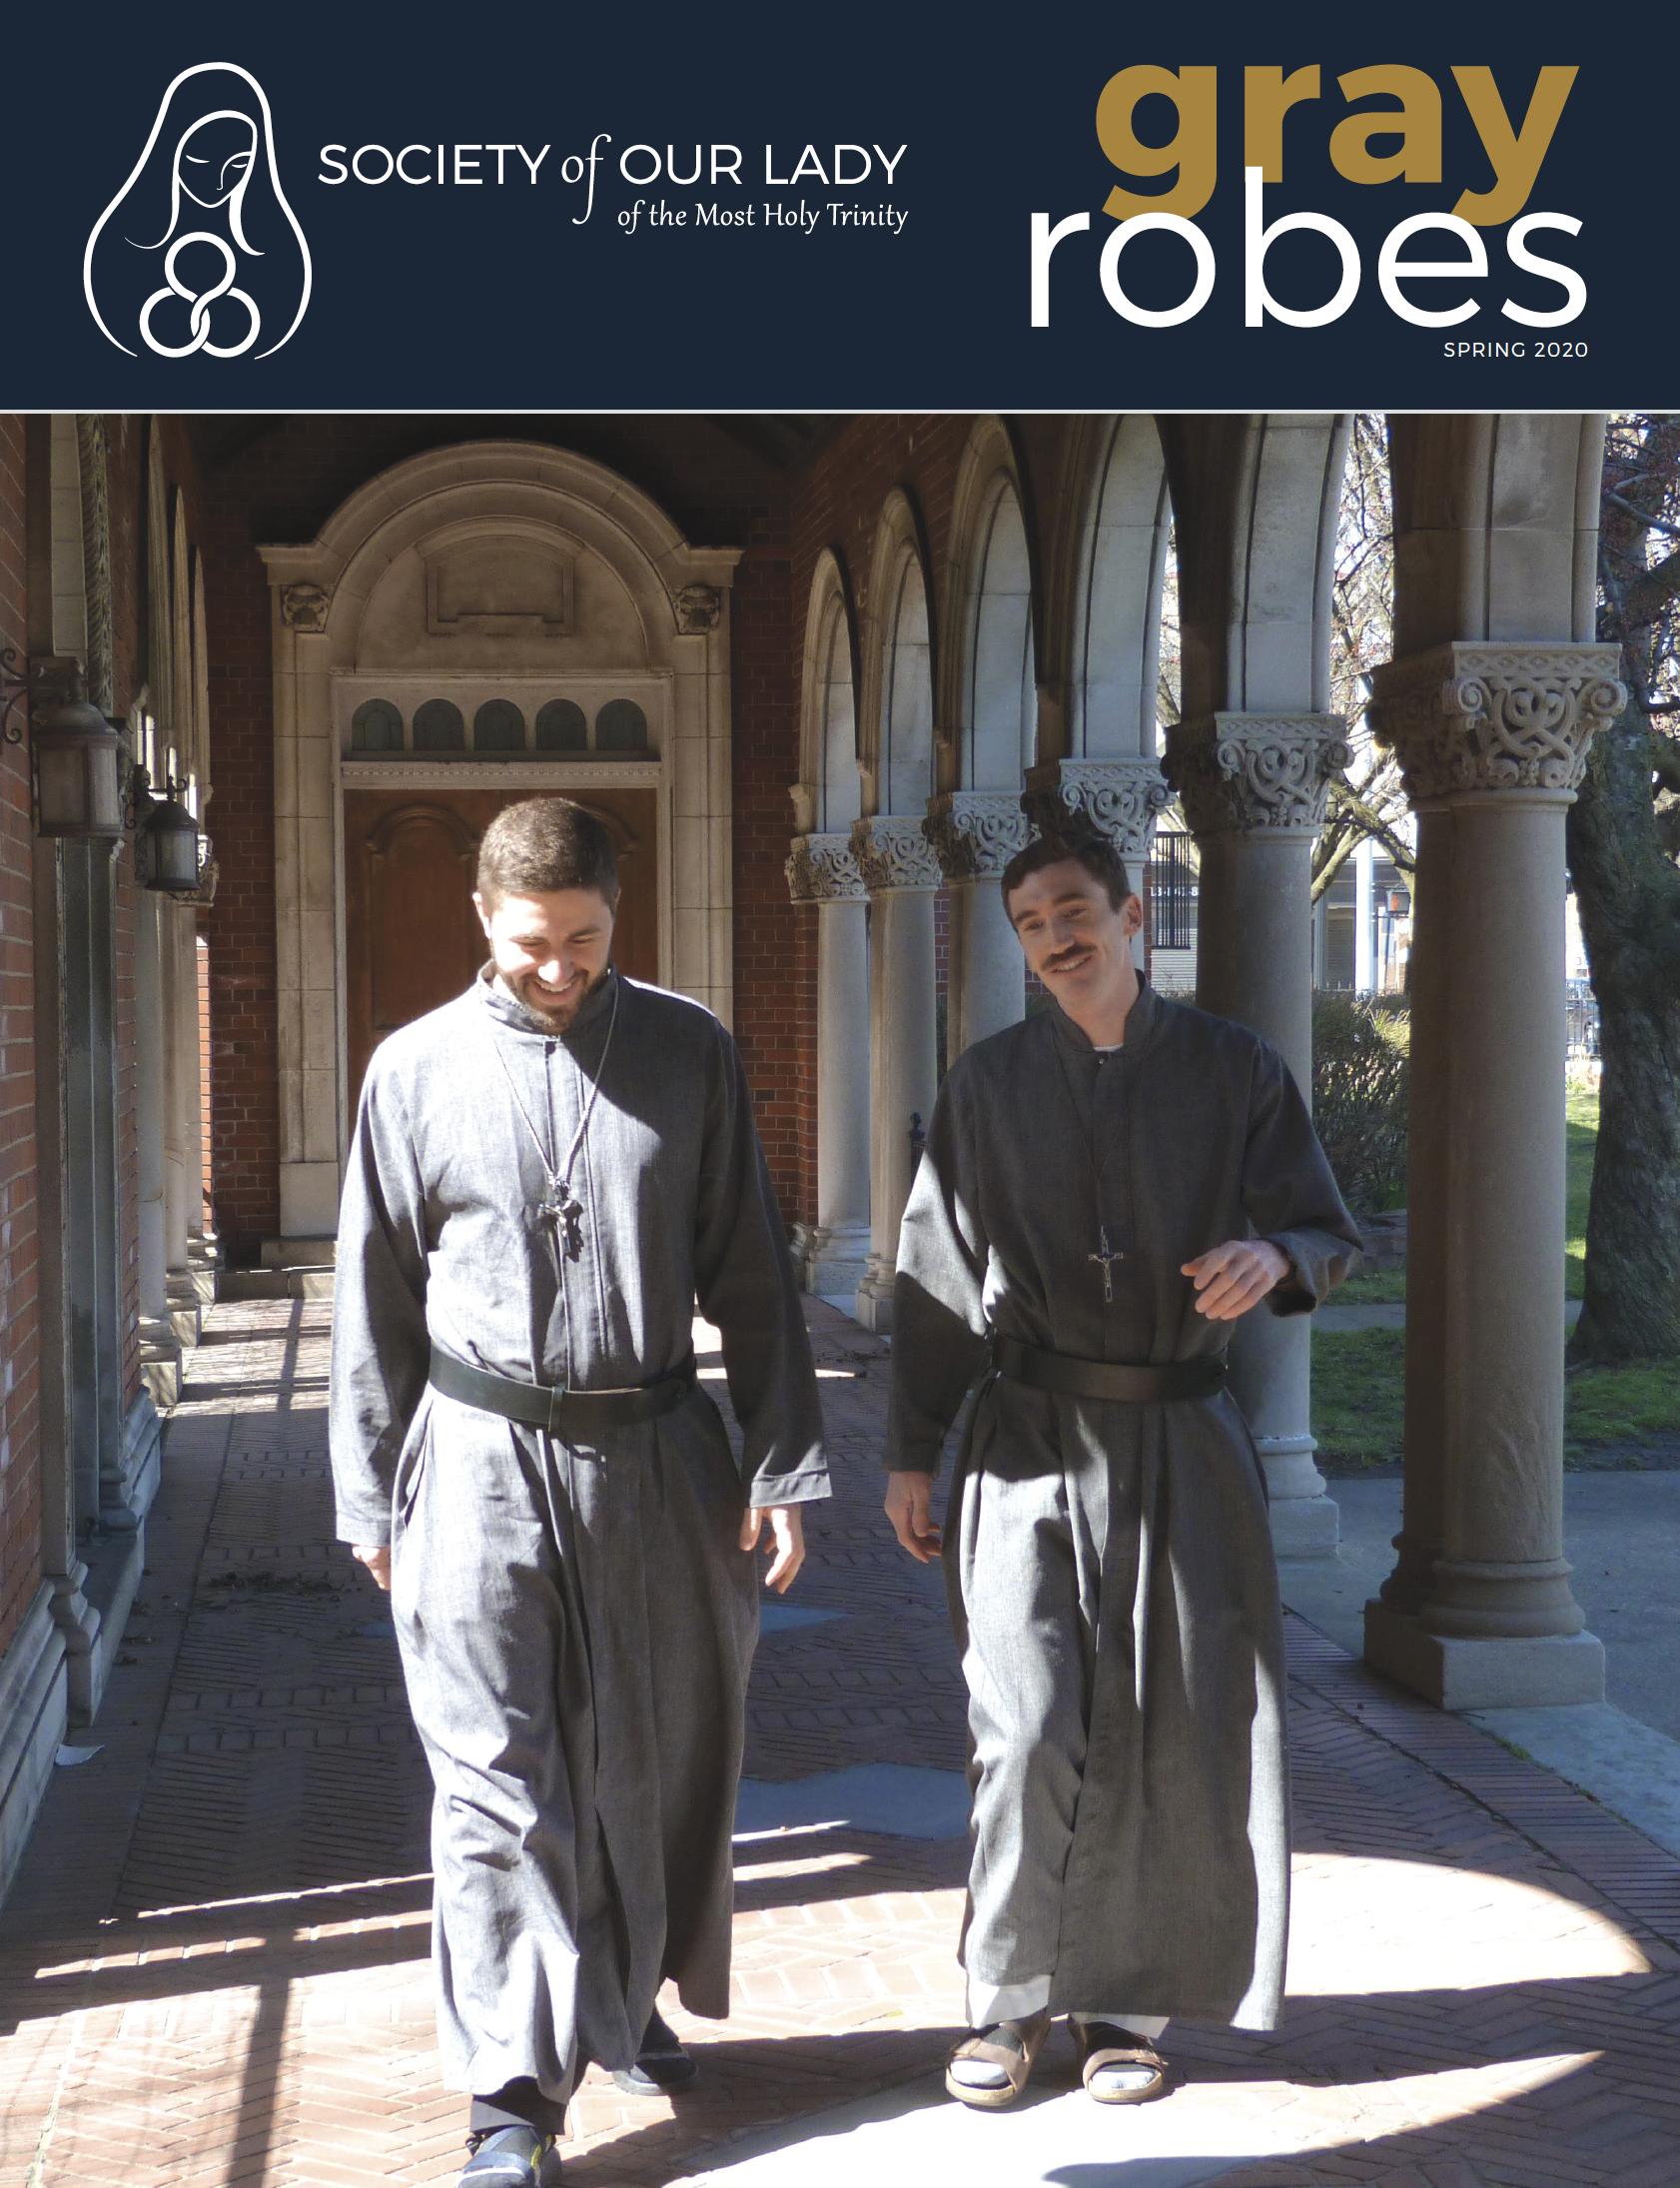 gray robes spring 2020